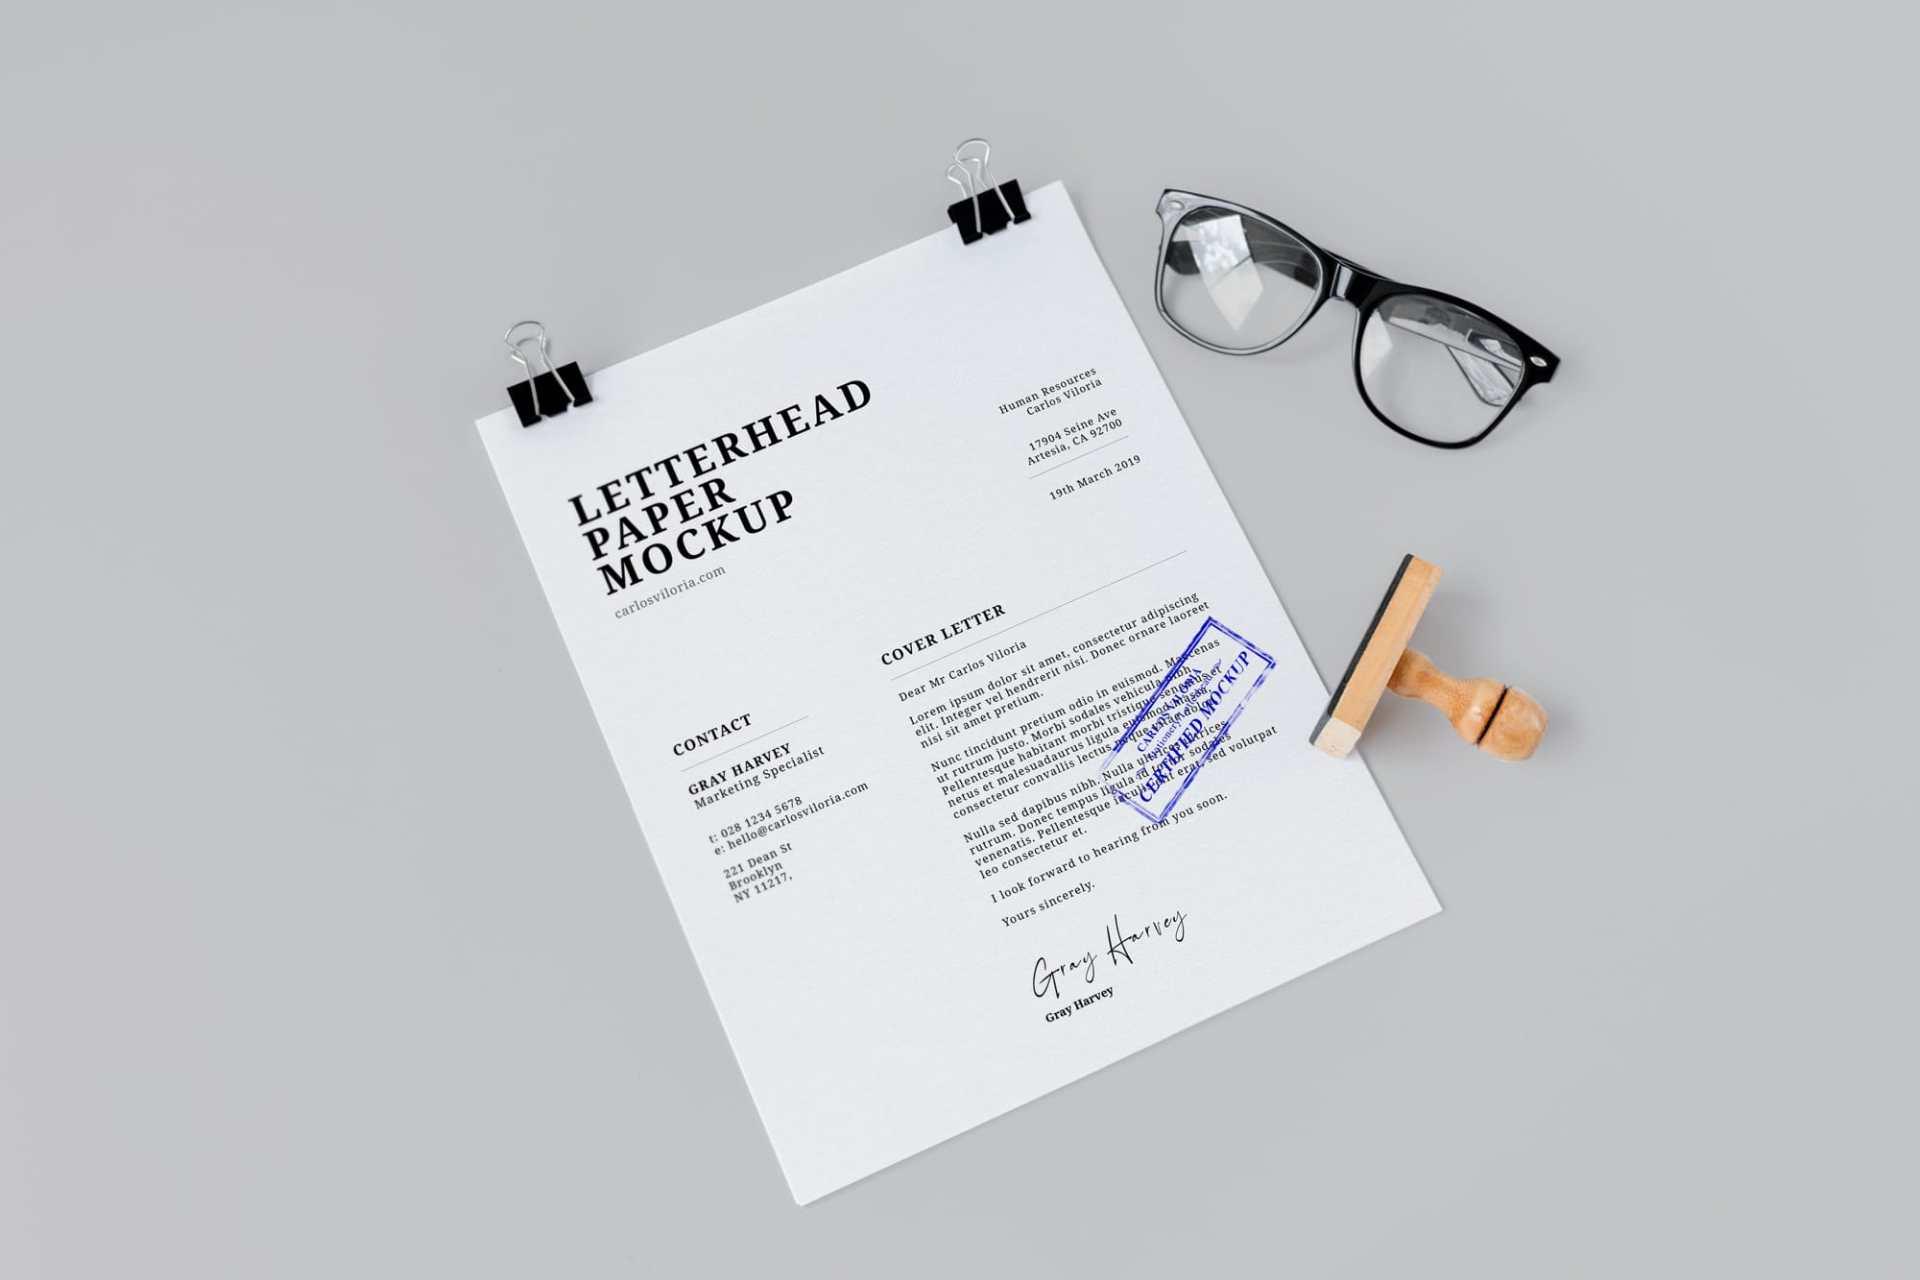 Free Letterhead Paper Mockup 02